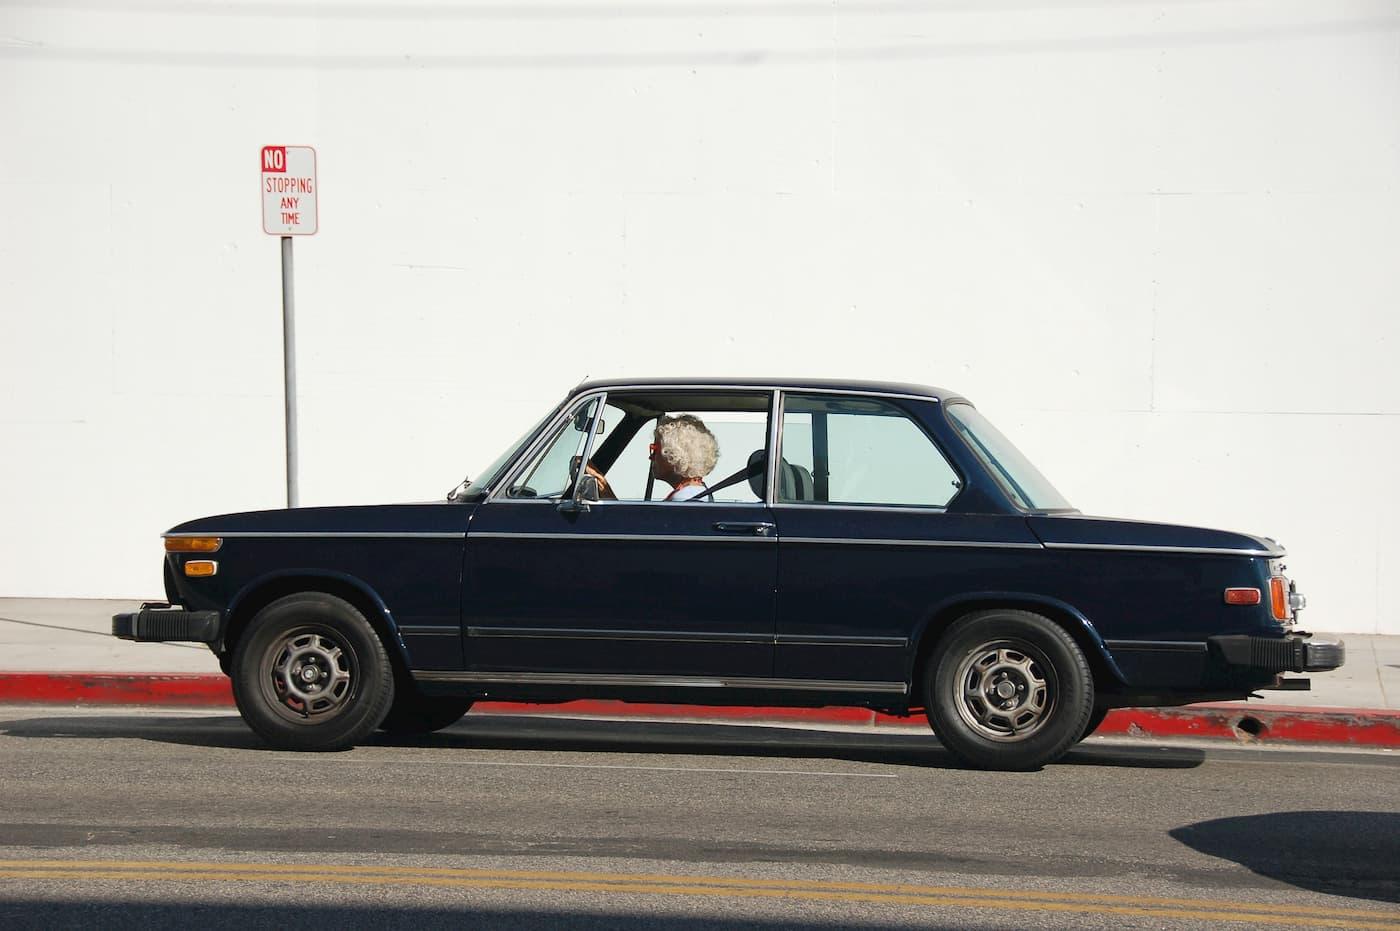 An older woman driving a vintage car.